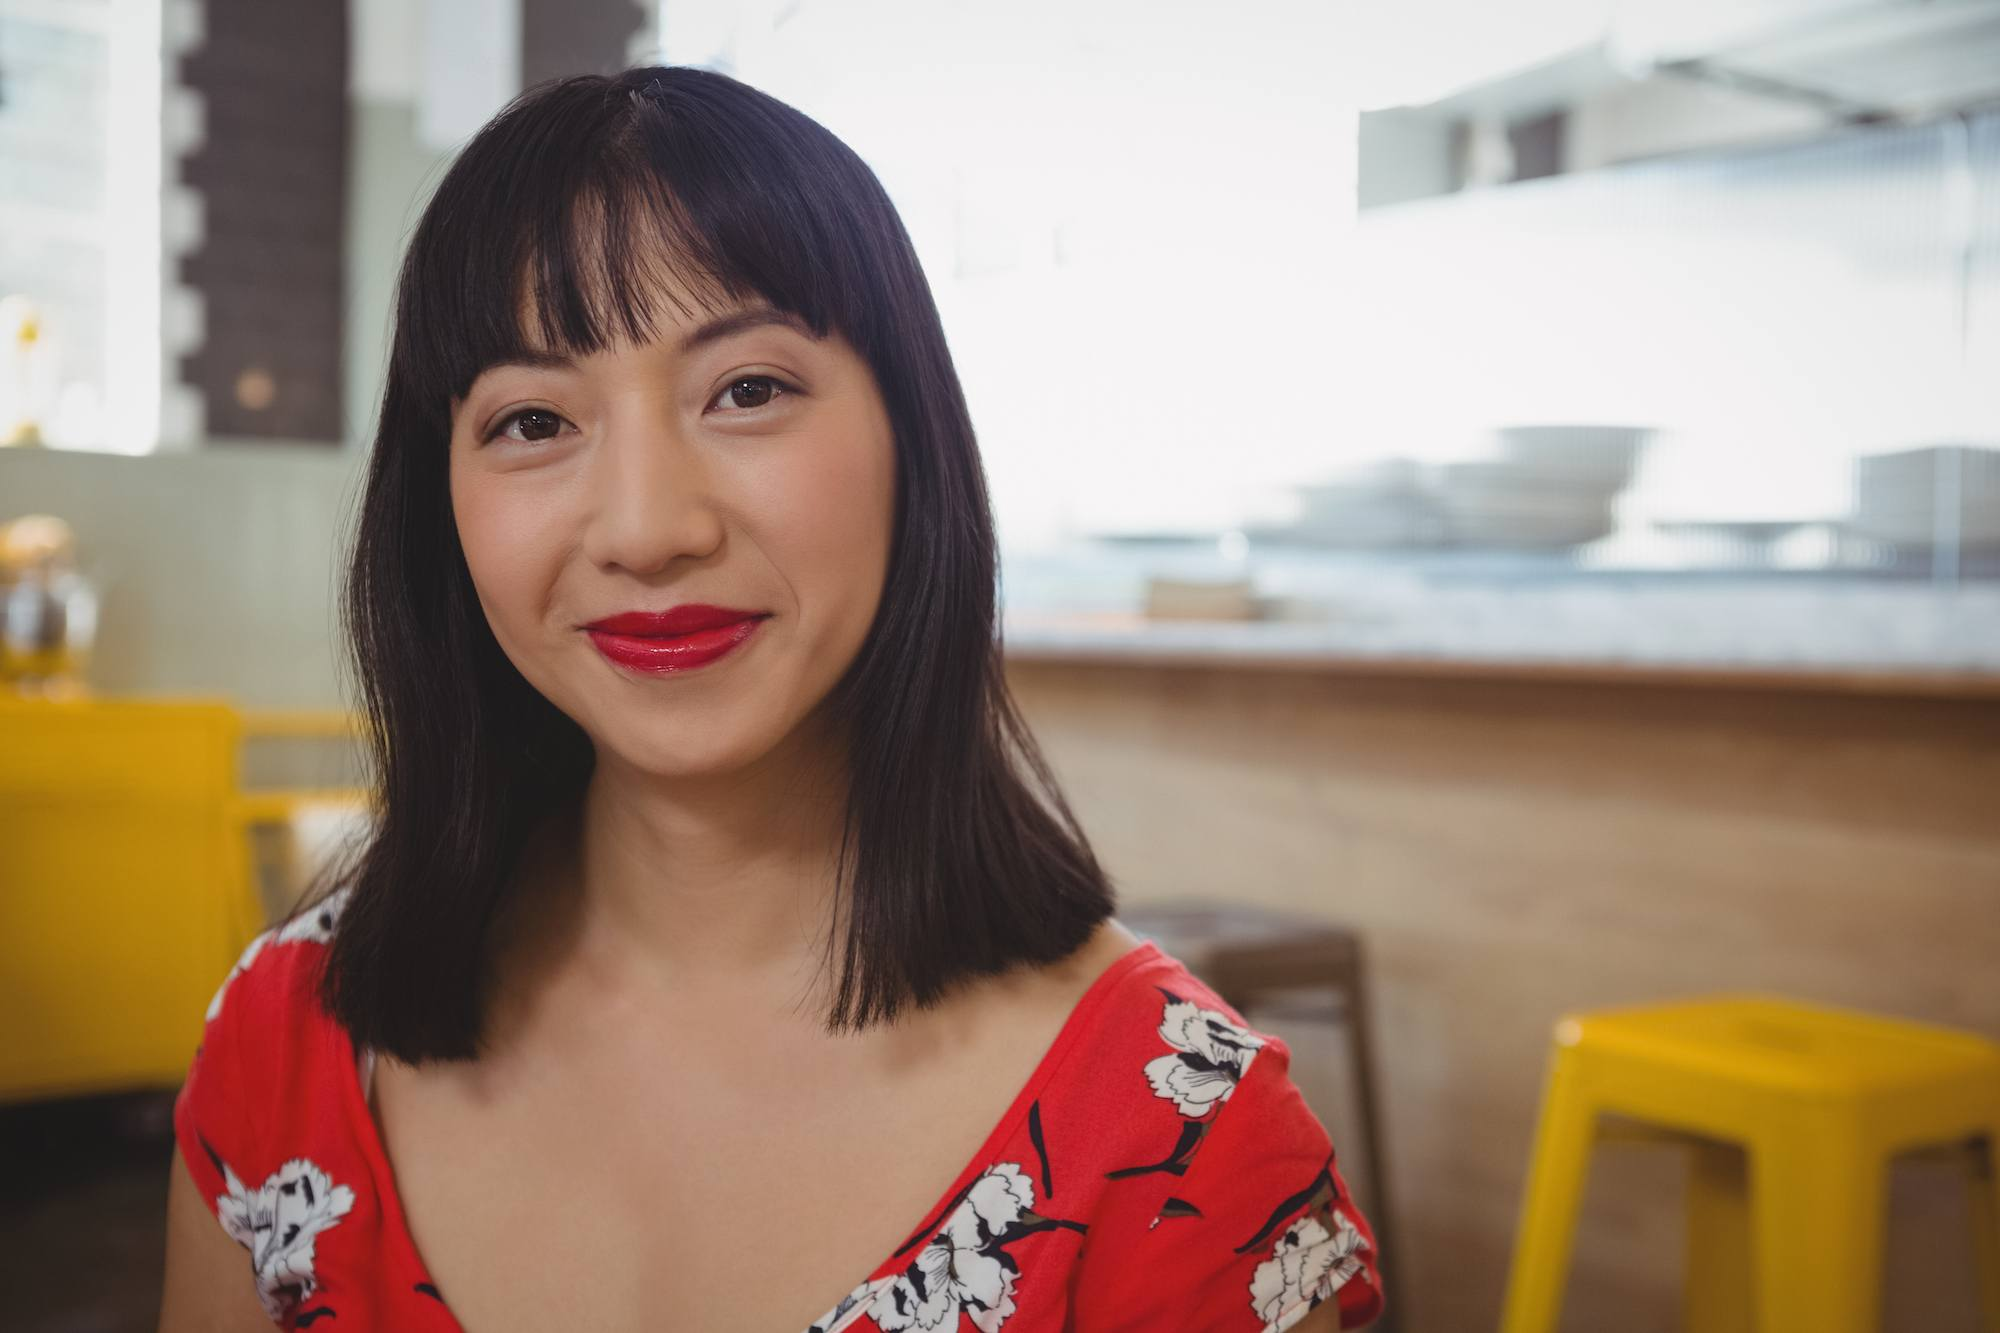 Cara mengatasi rambut berminyak pada wanita asia dengan rambut hitam model rambut bob sebahu dengan poni tersenyum menatap kamera